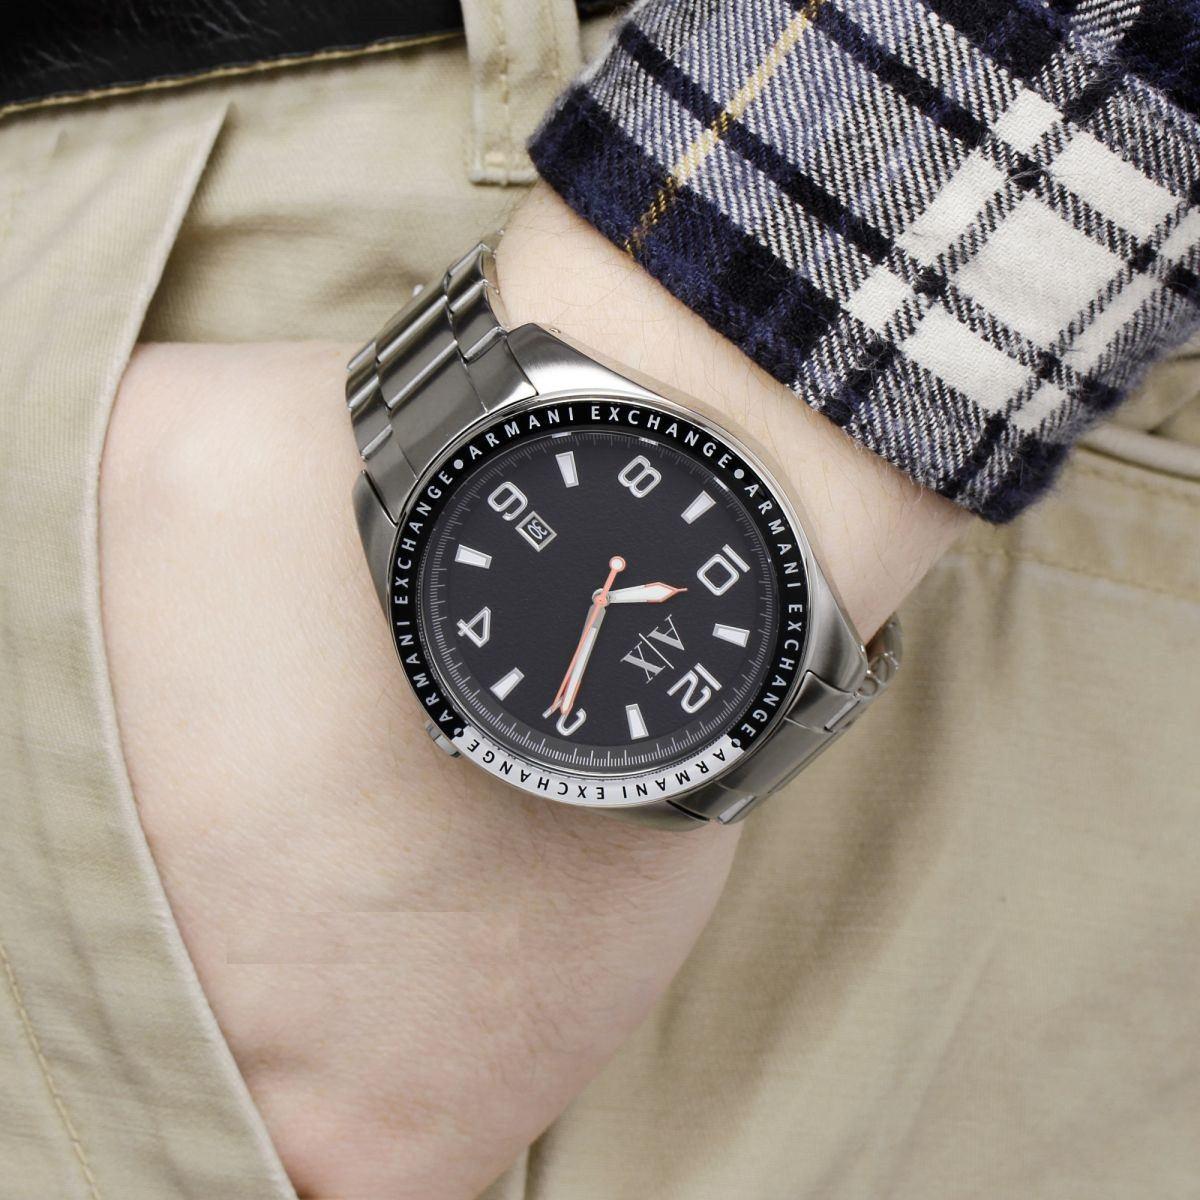 c7efcae96de Carregando zoom... relógio armani exchange ax1303 maculino pulseira aço  garanti